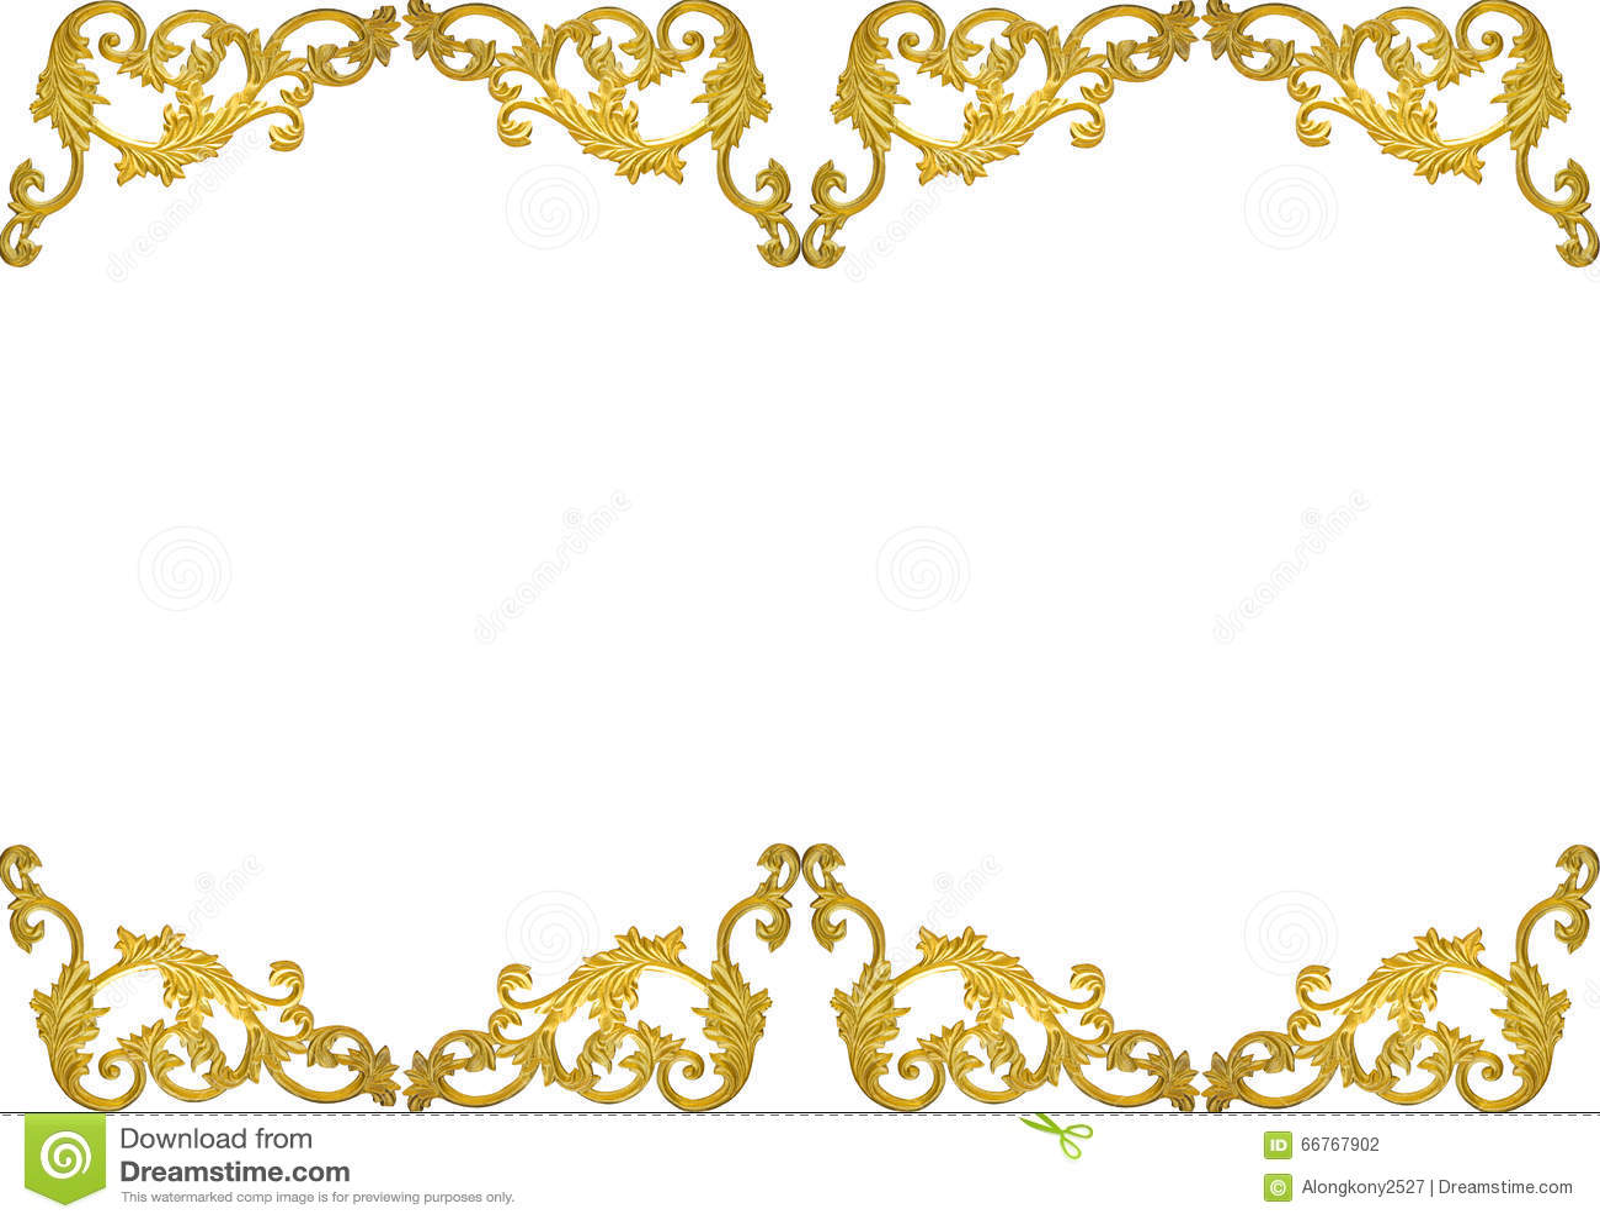 Greek Key Border Frame Sea Colours Background Royalty-Free ...